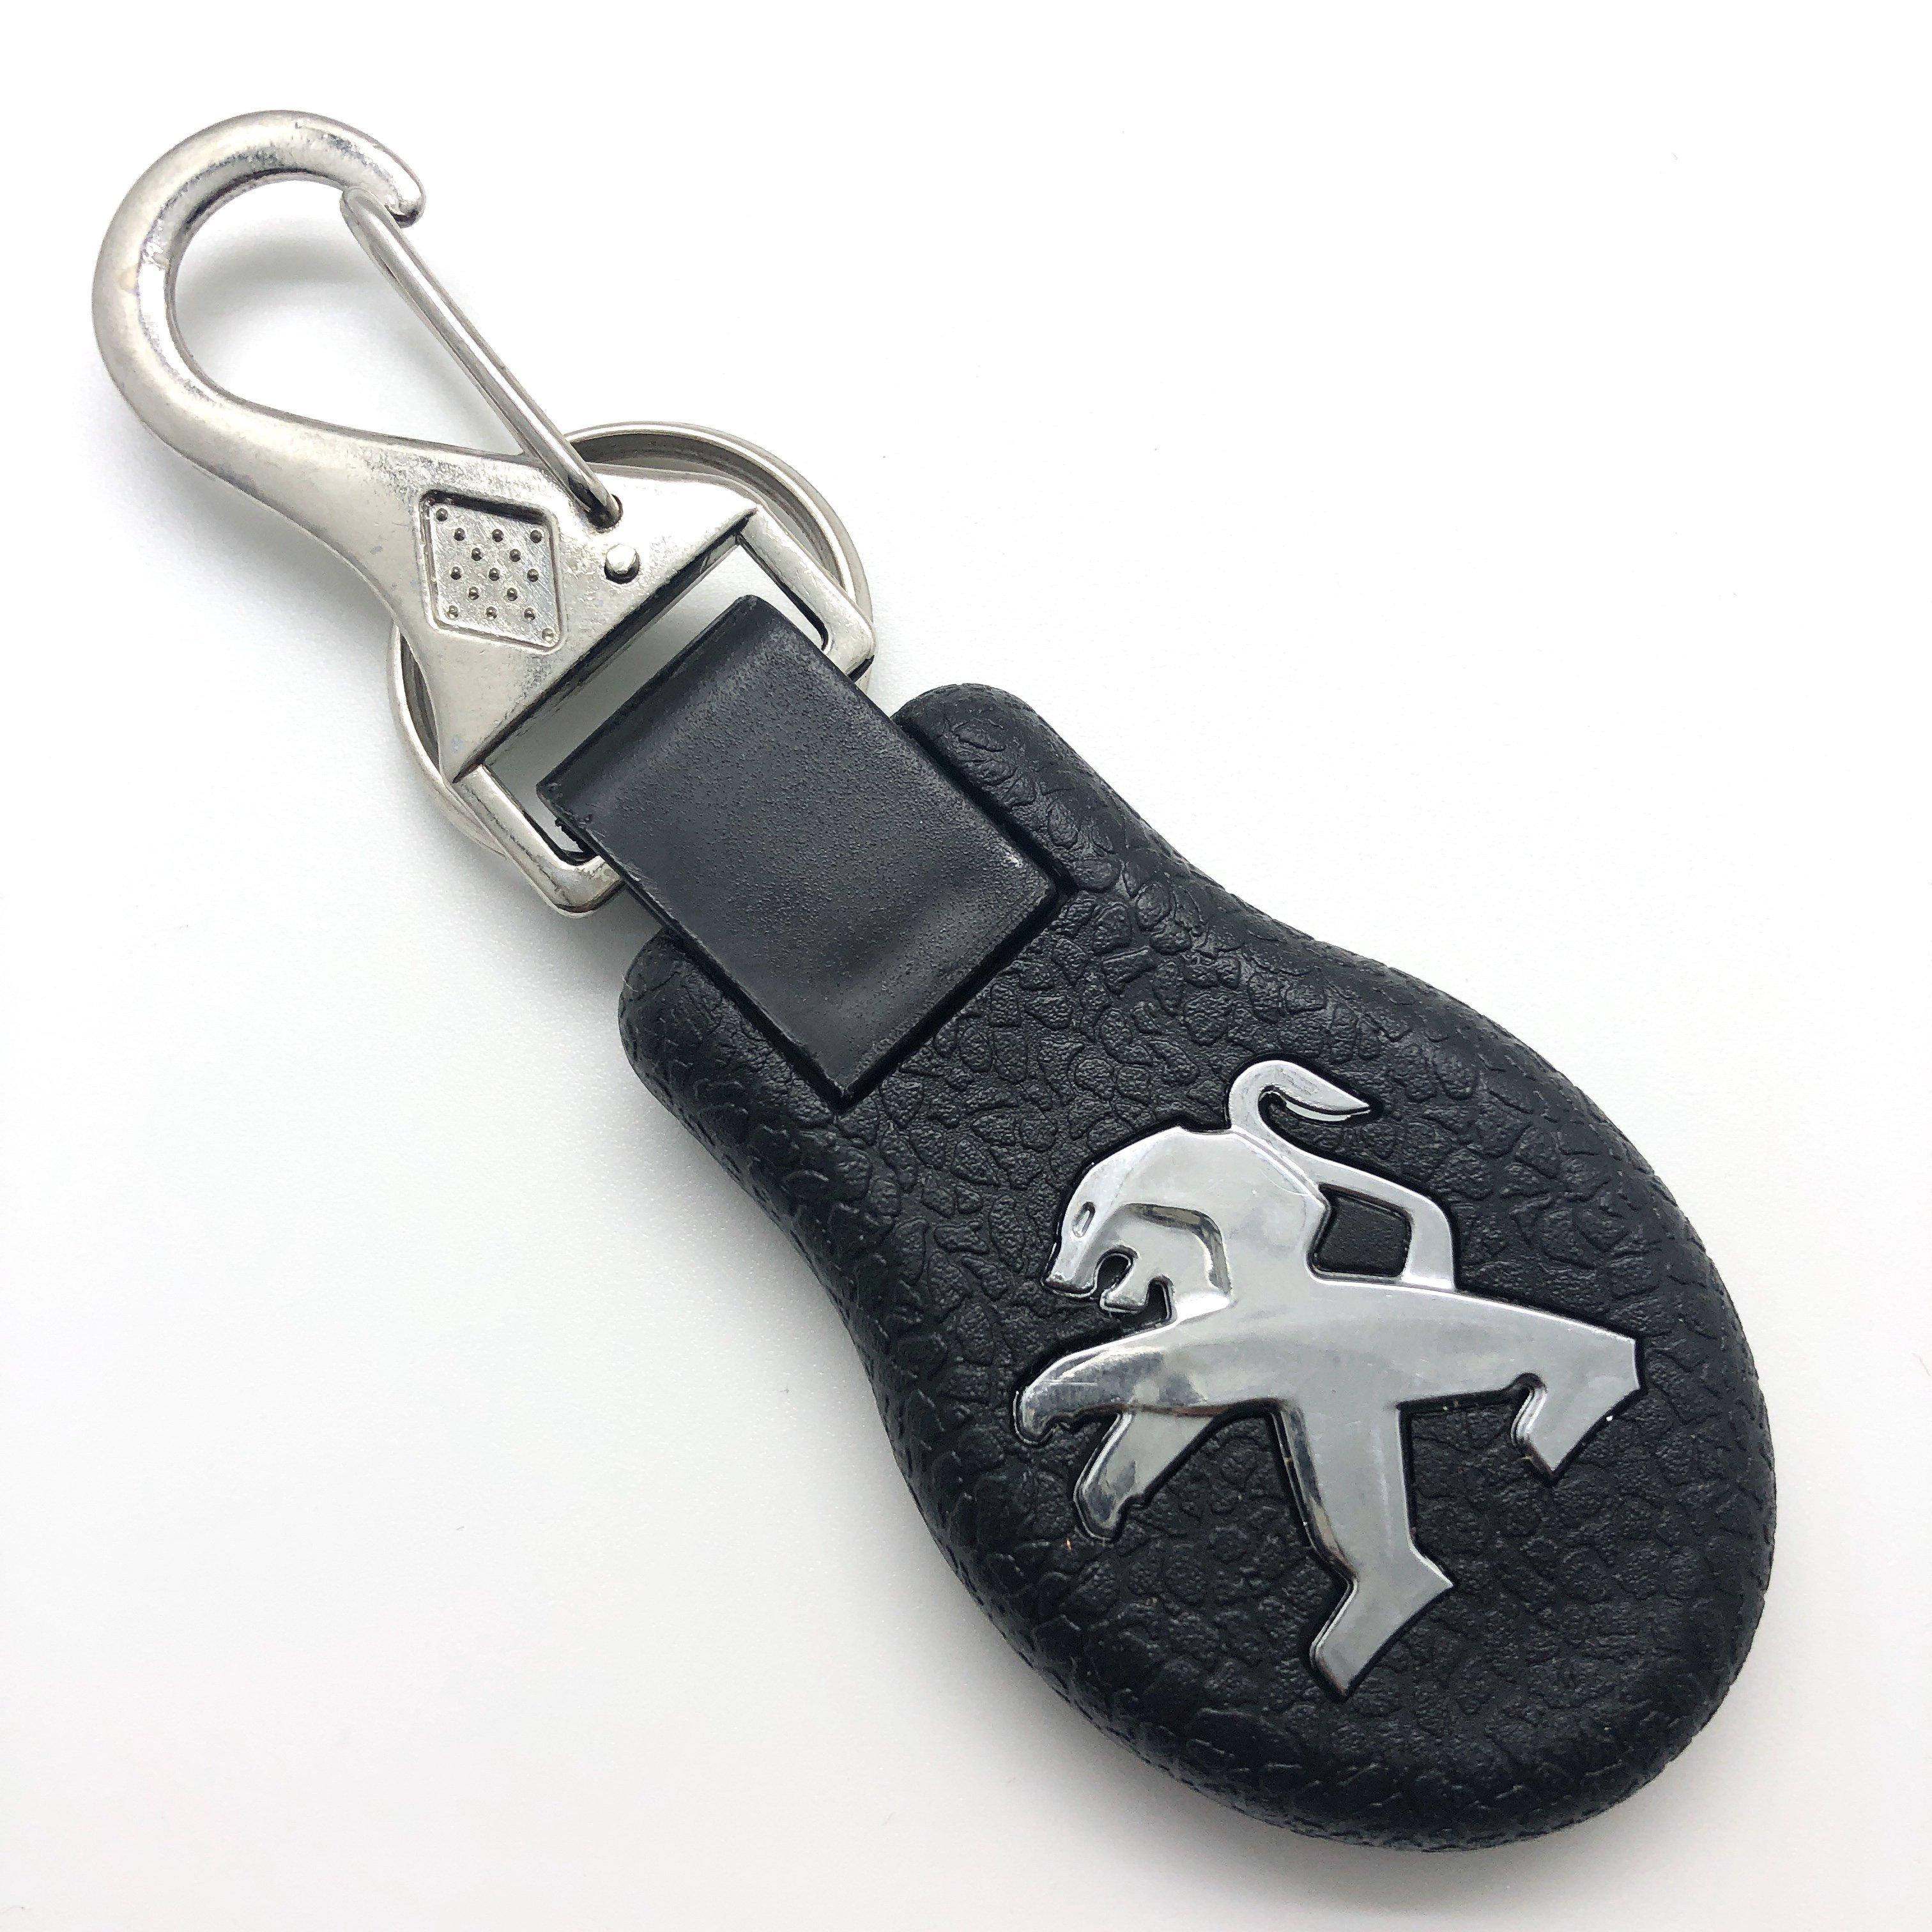 Peugeot Rigid : Keychain Gift Logo Ring Key Fob Car Holder Plastic